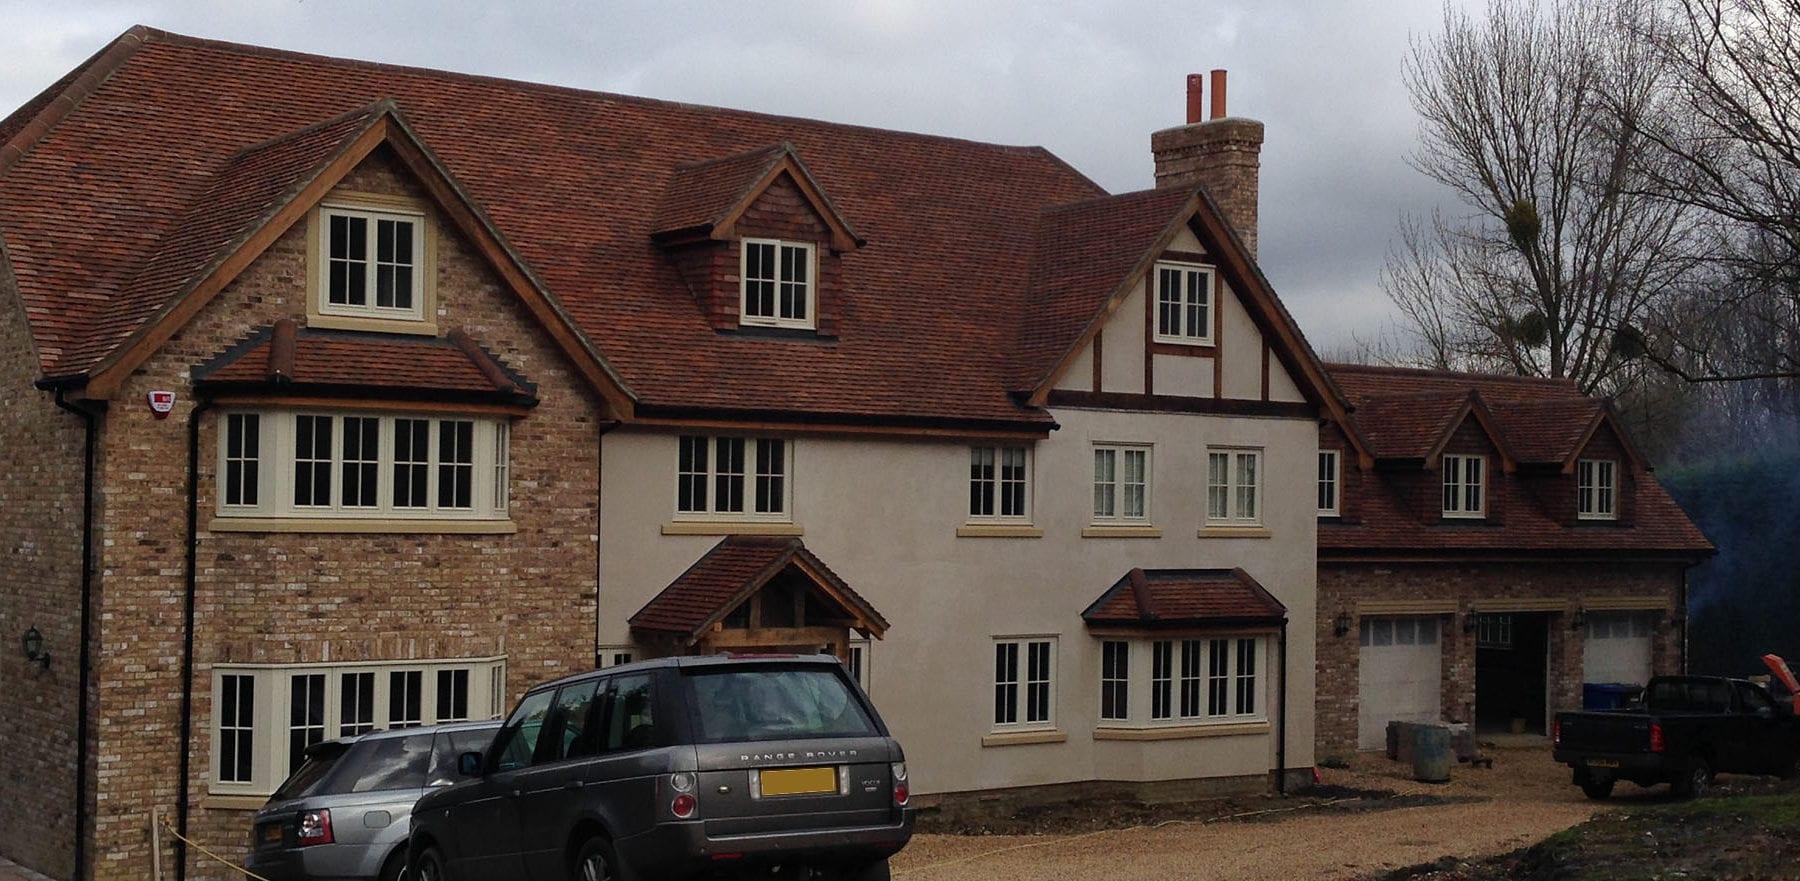 Lifestiles - Handmade Brown Clay Roof Tiles - Sunningdale, England 6